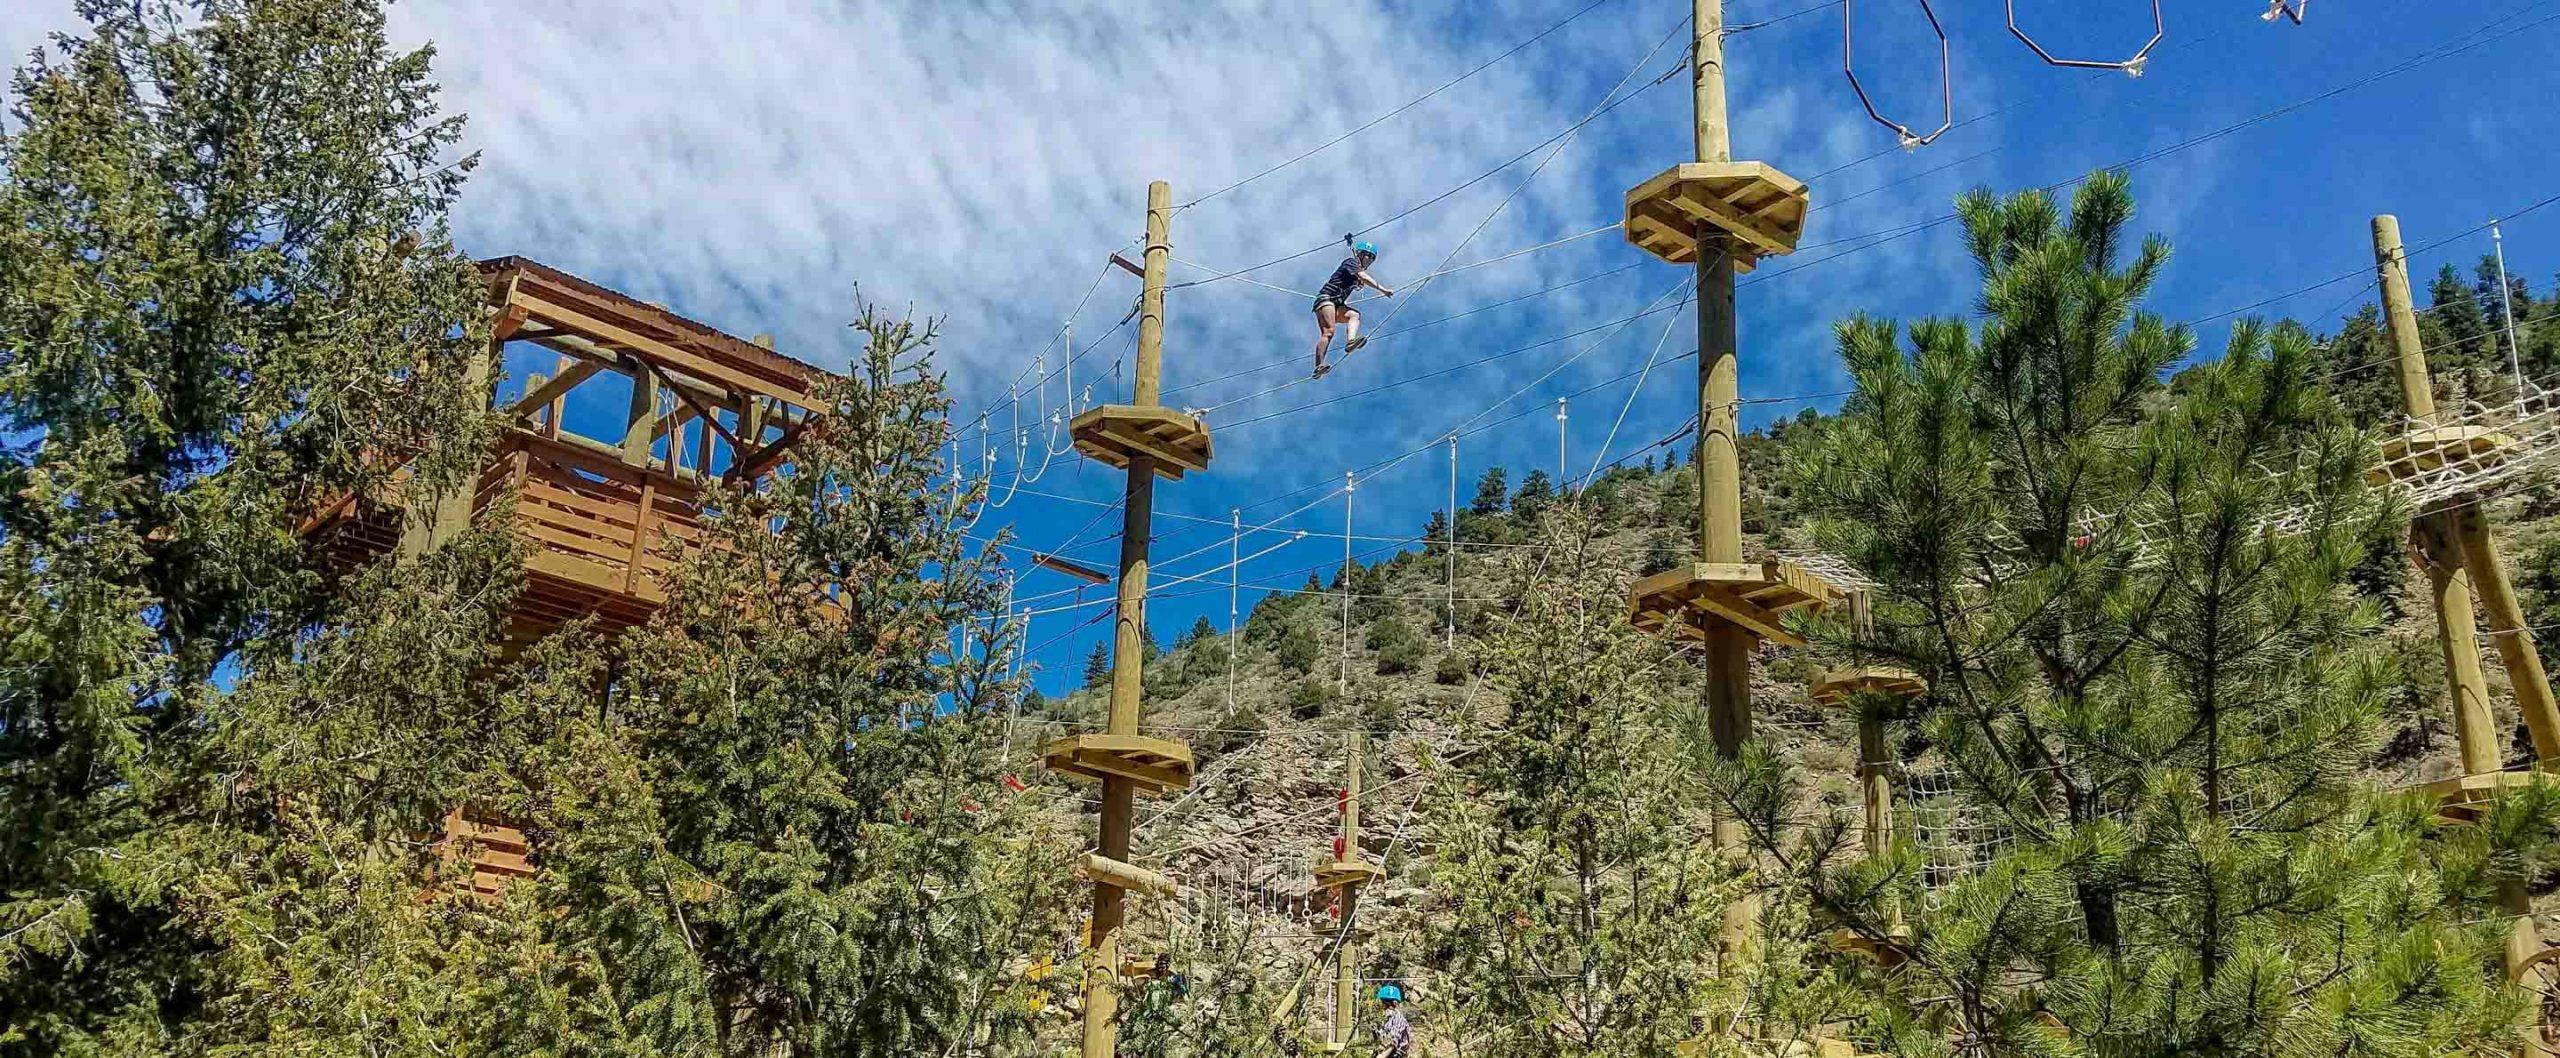 Sky Trek Aerial Park In Idaho Springs Colorado